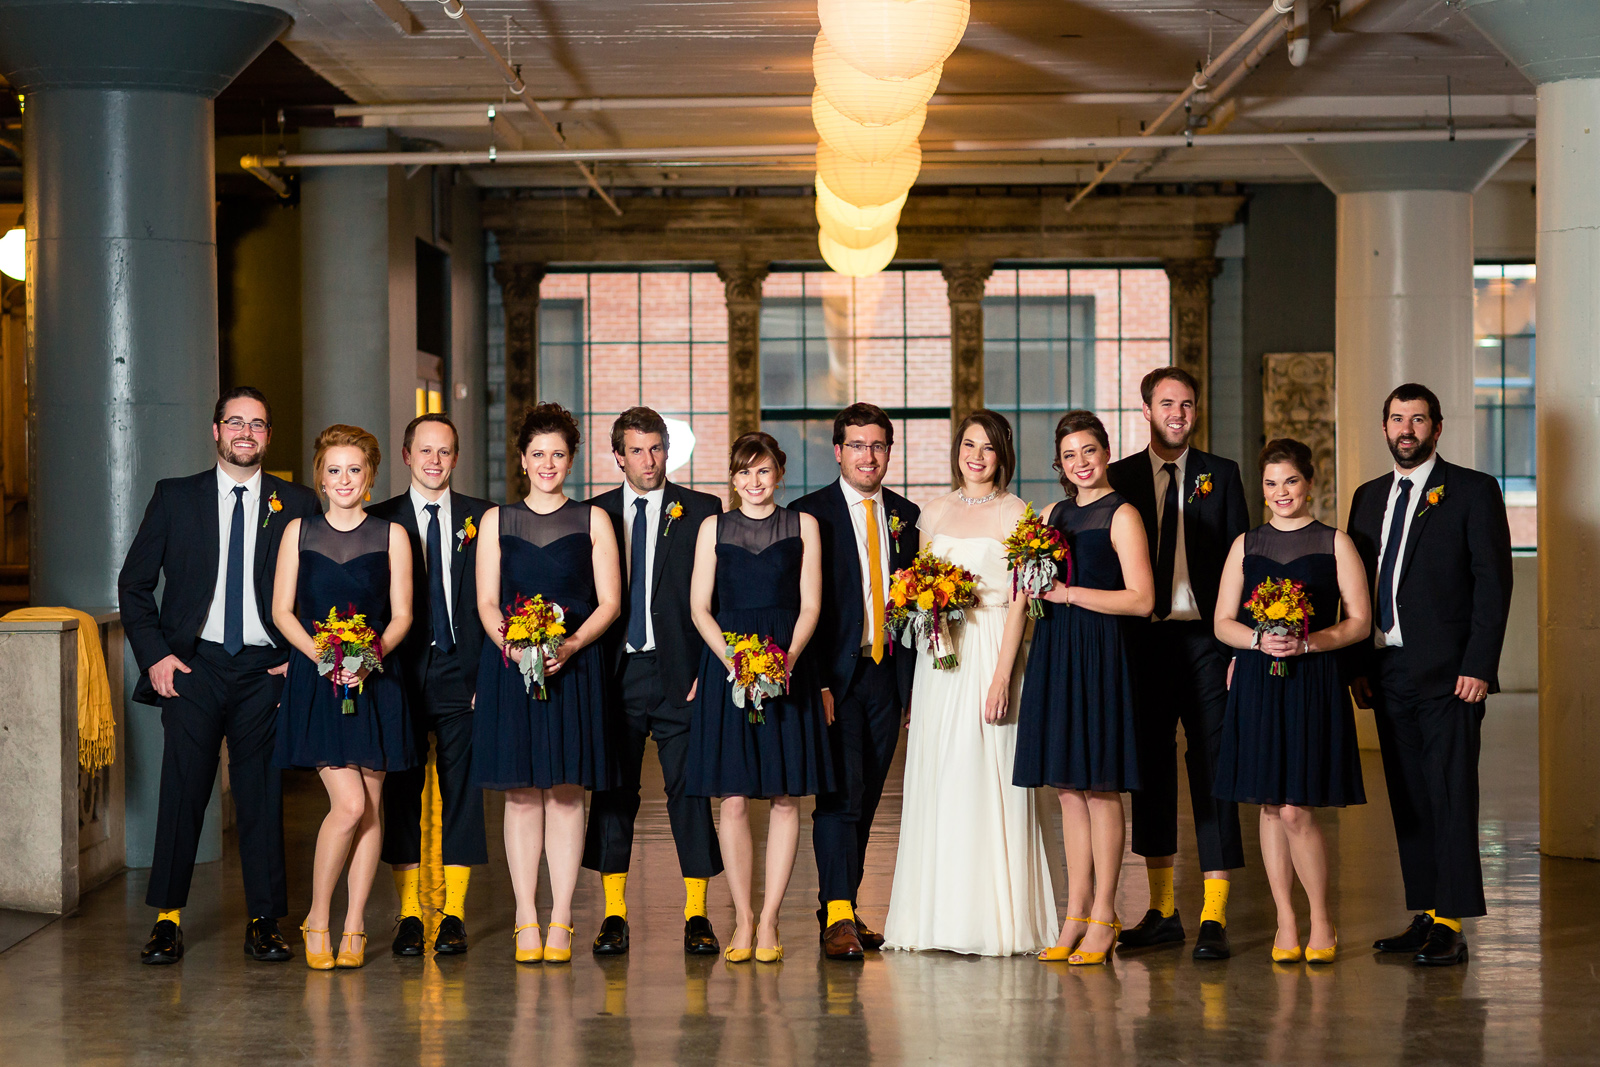 Oldani Photography-St Louis-Wedding Photos-wedding photographer-wedding party-City Museum_20141122_16550553.jpg